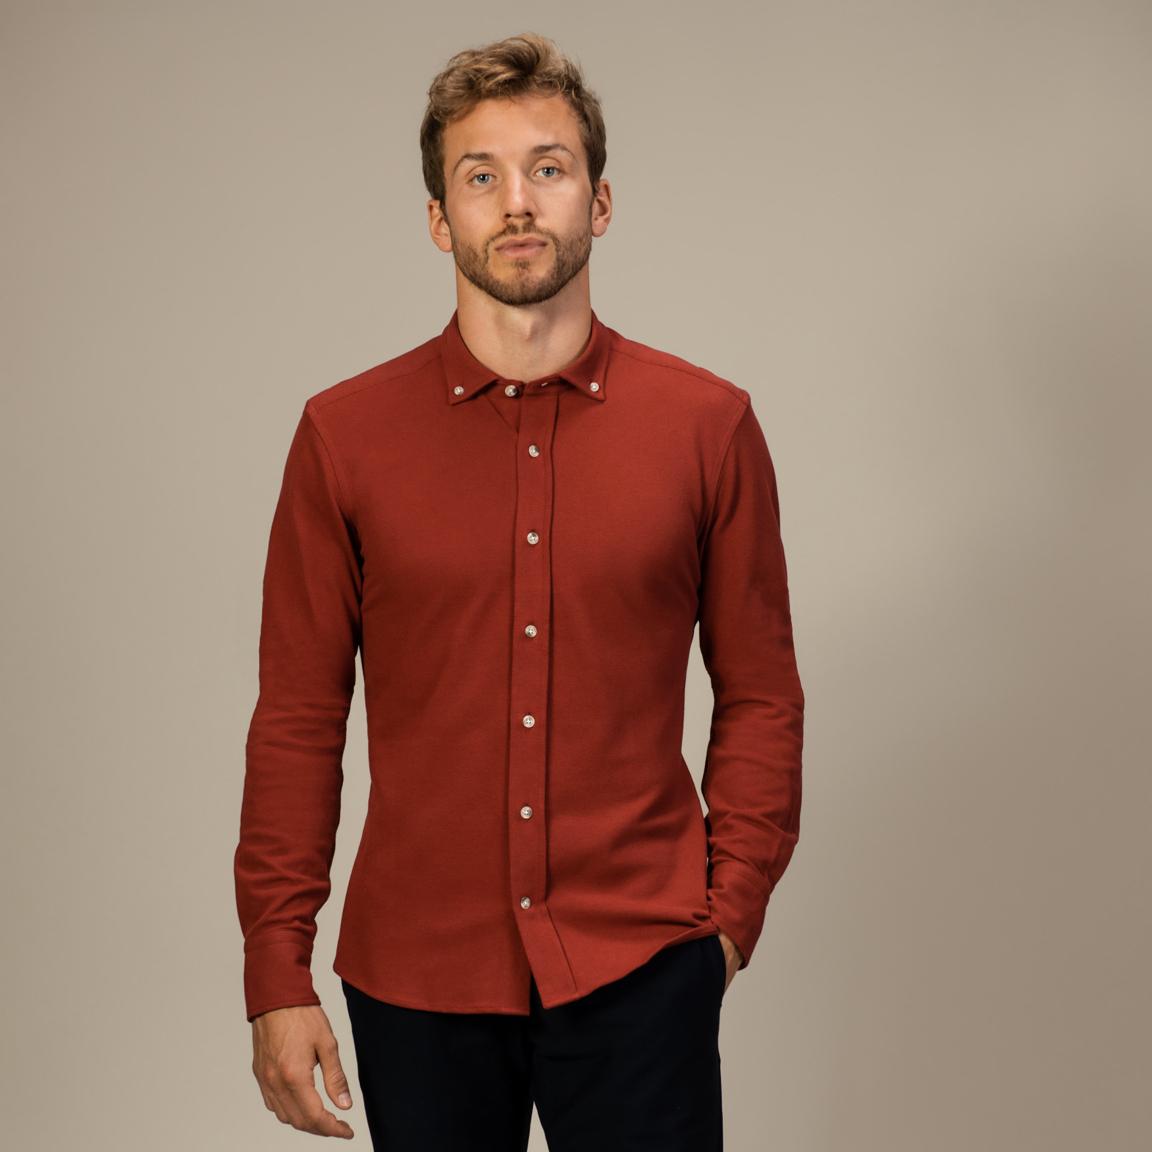 Red long-sleeved button down piqué shirt